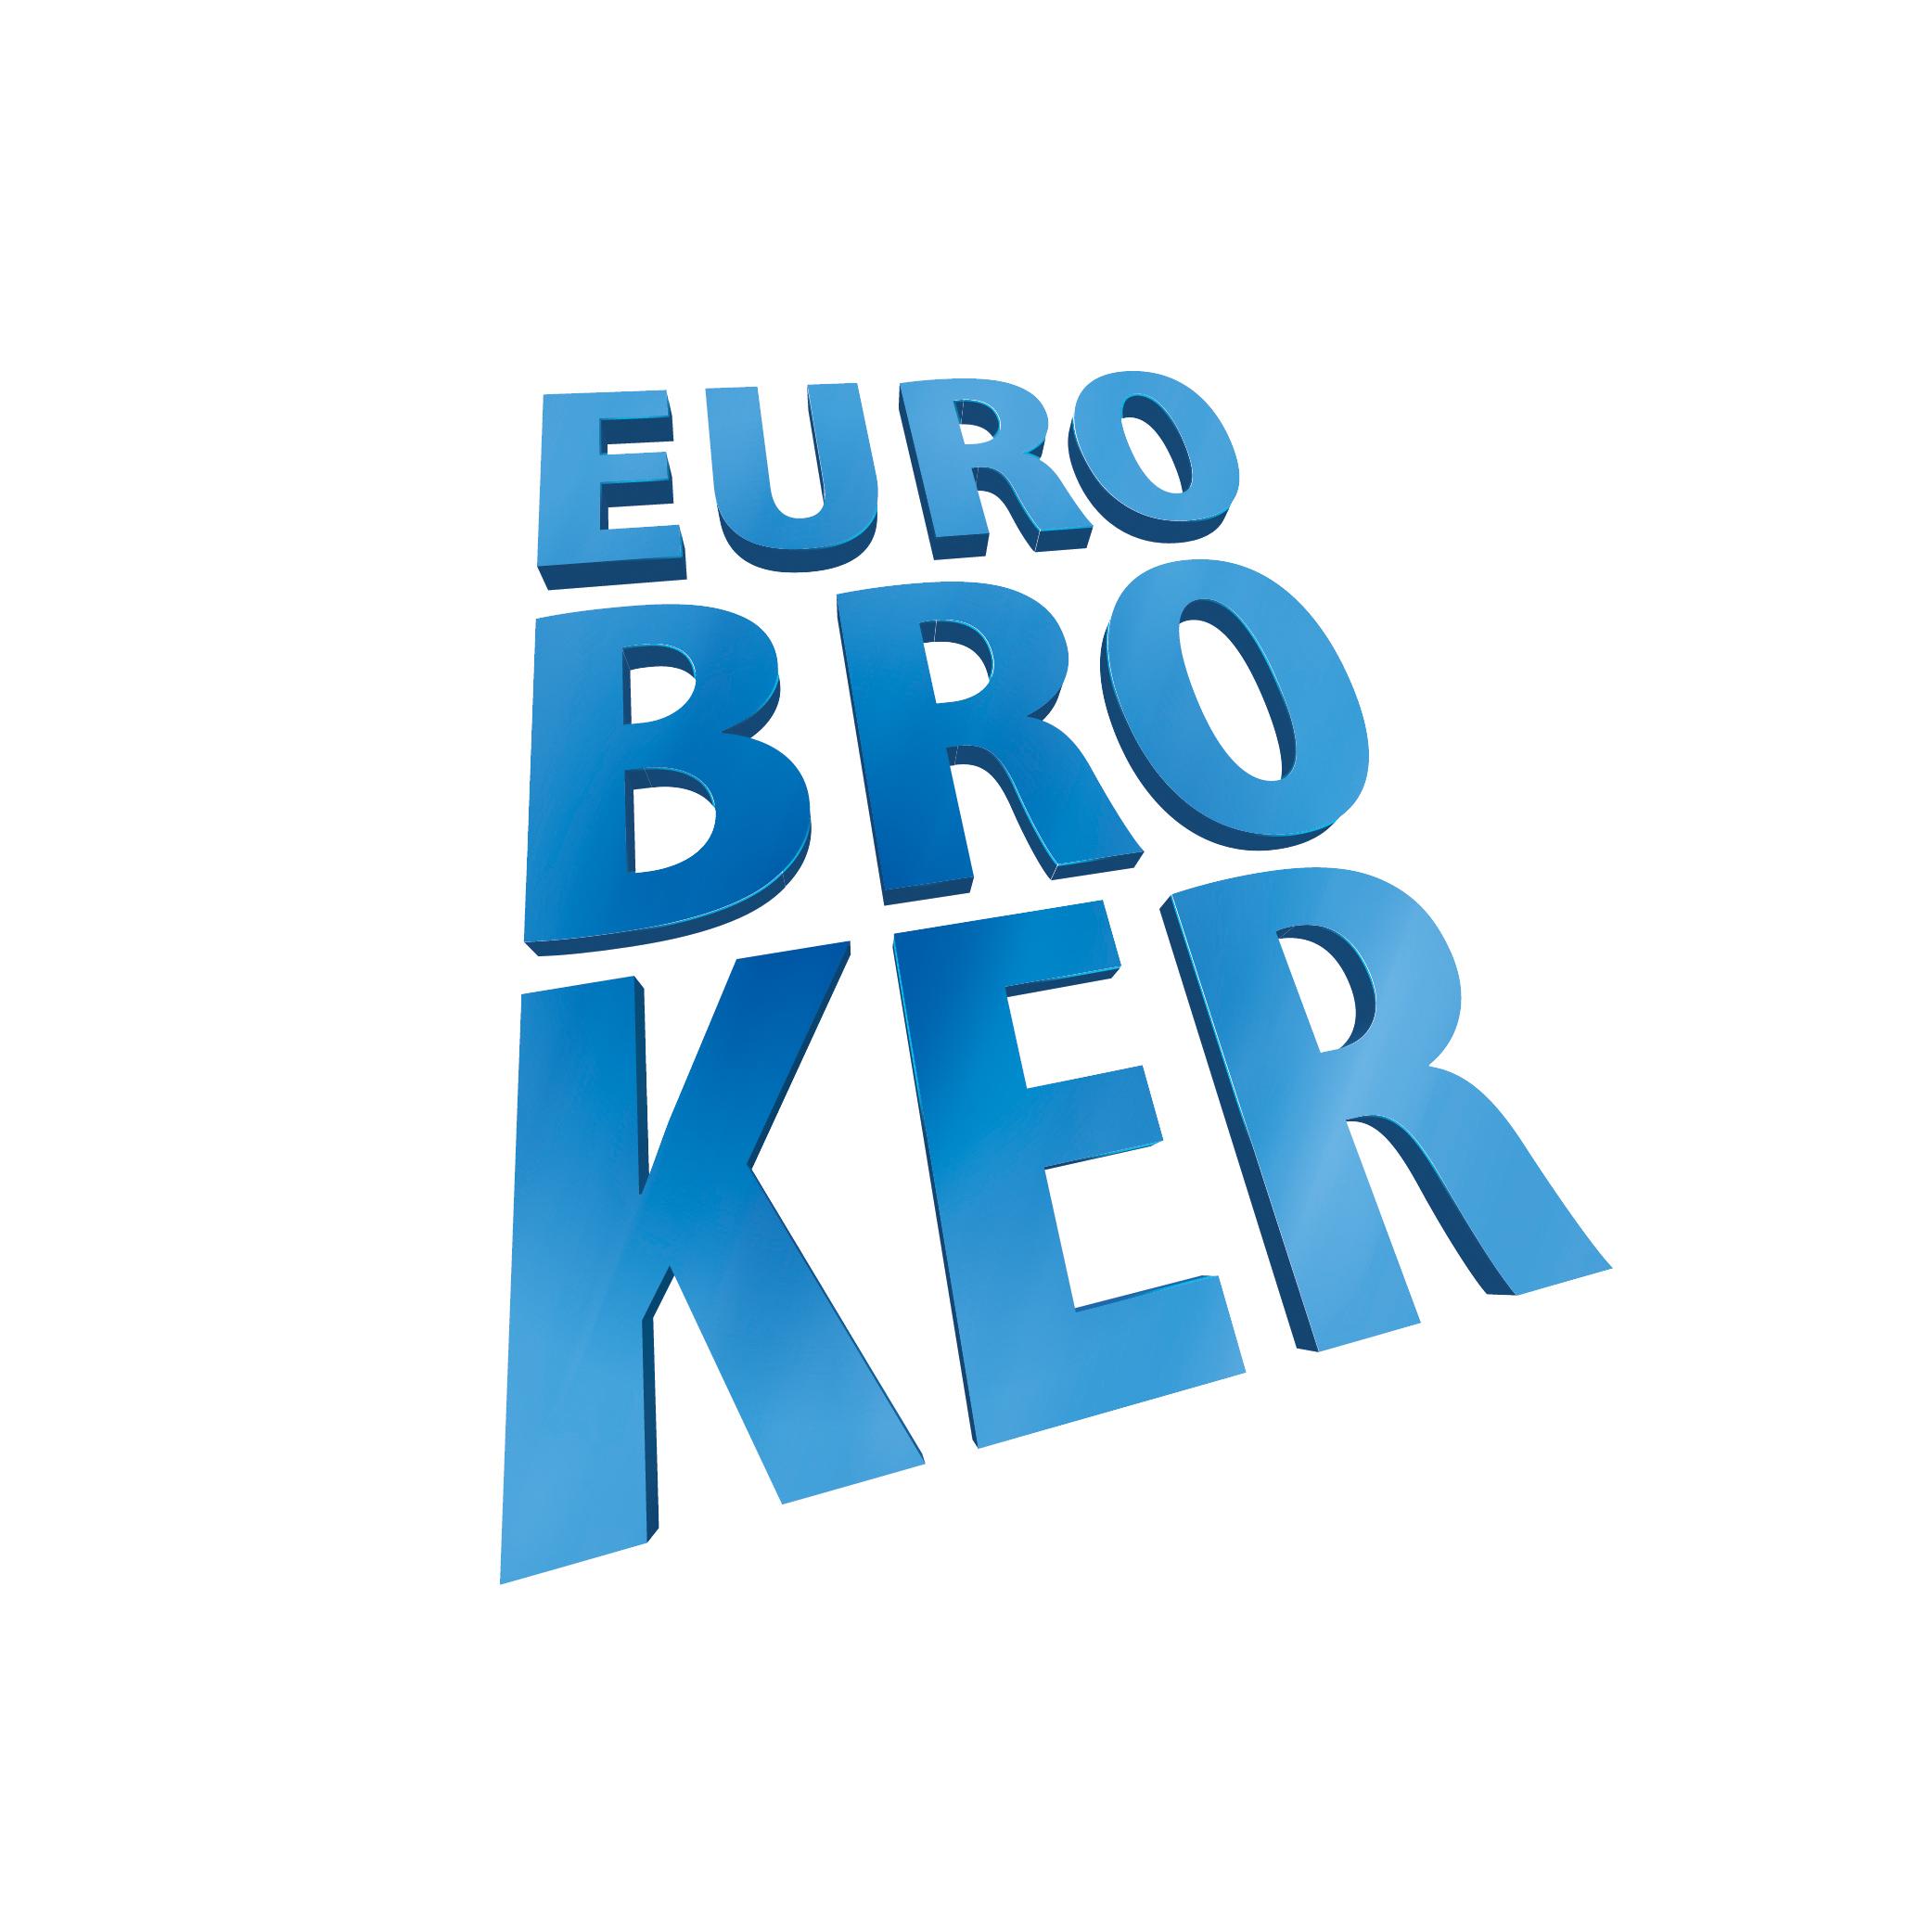 Разработка логотипа компании для сайта фото f_4be9570505eee.jpg